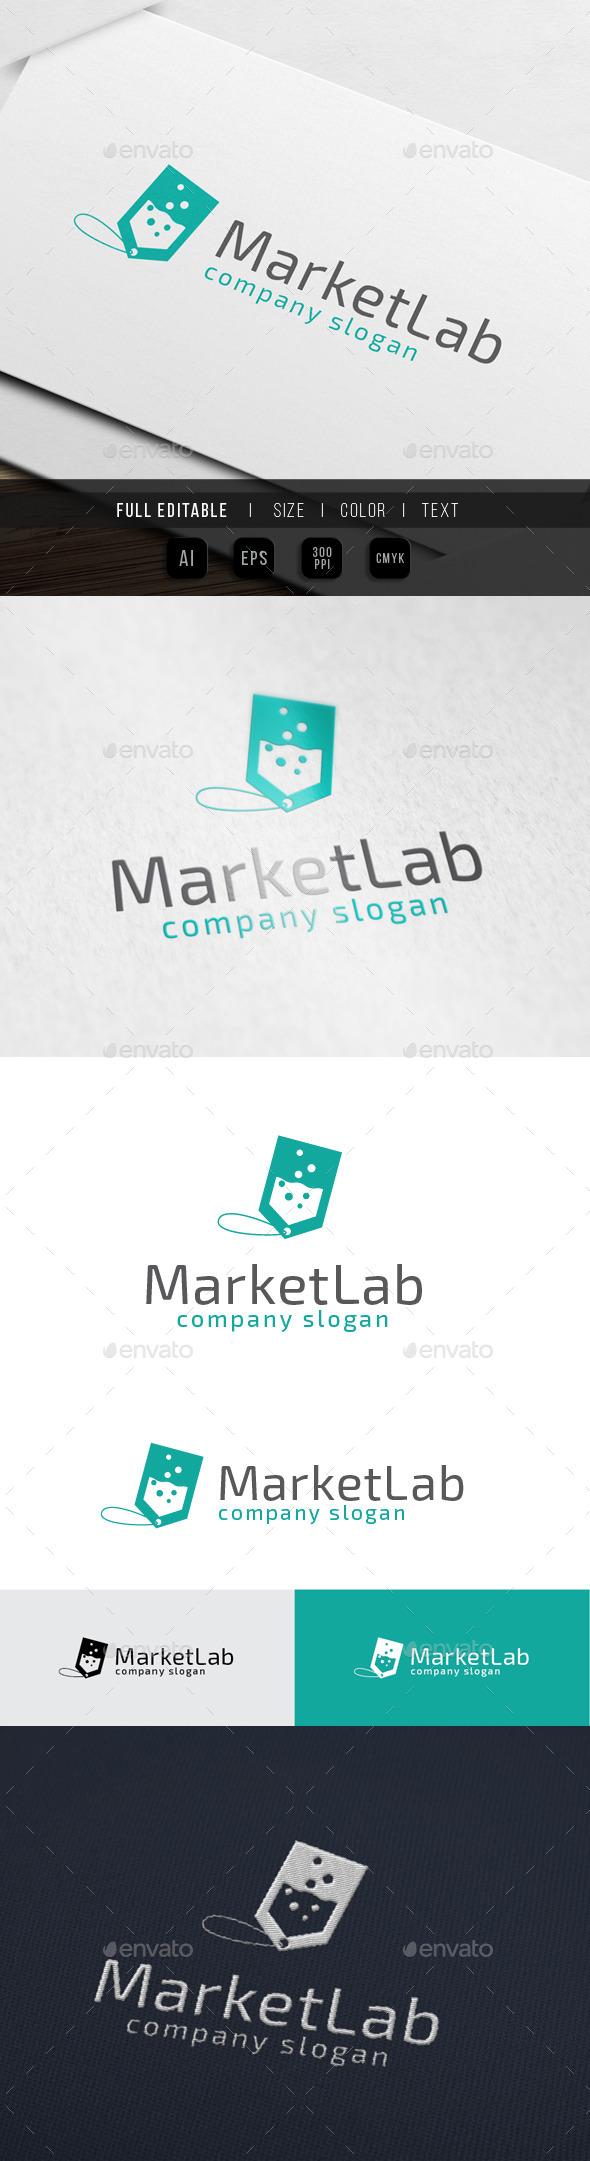 Market Lab - Bigsale - Symbols Logo Templates